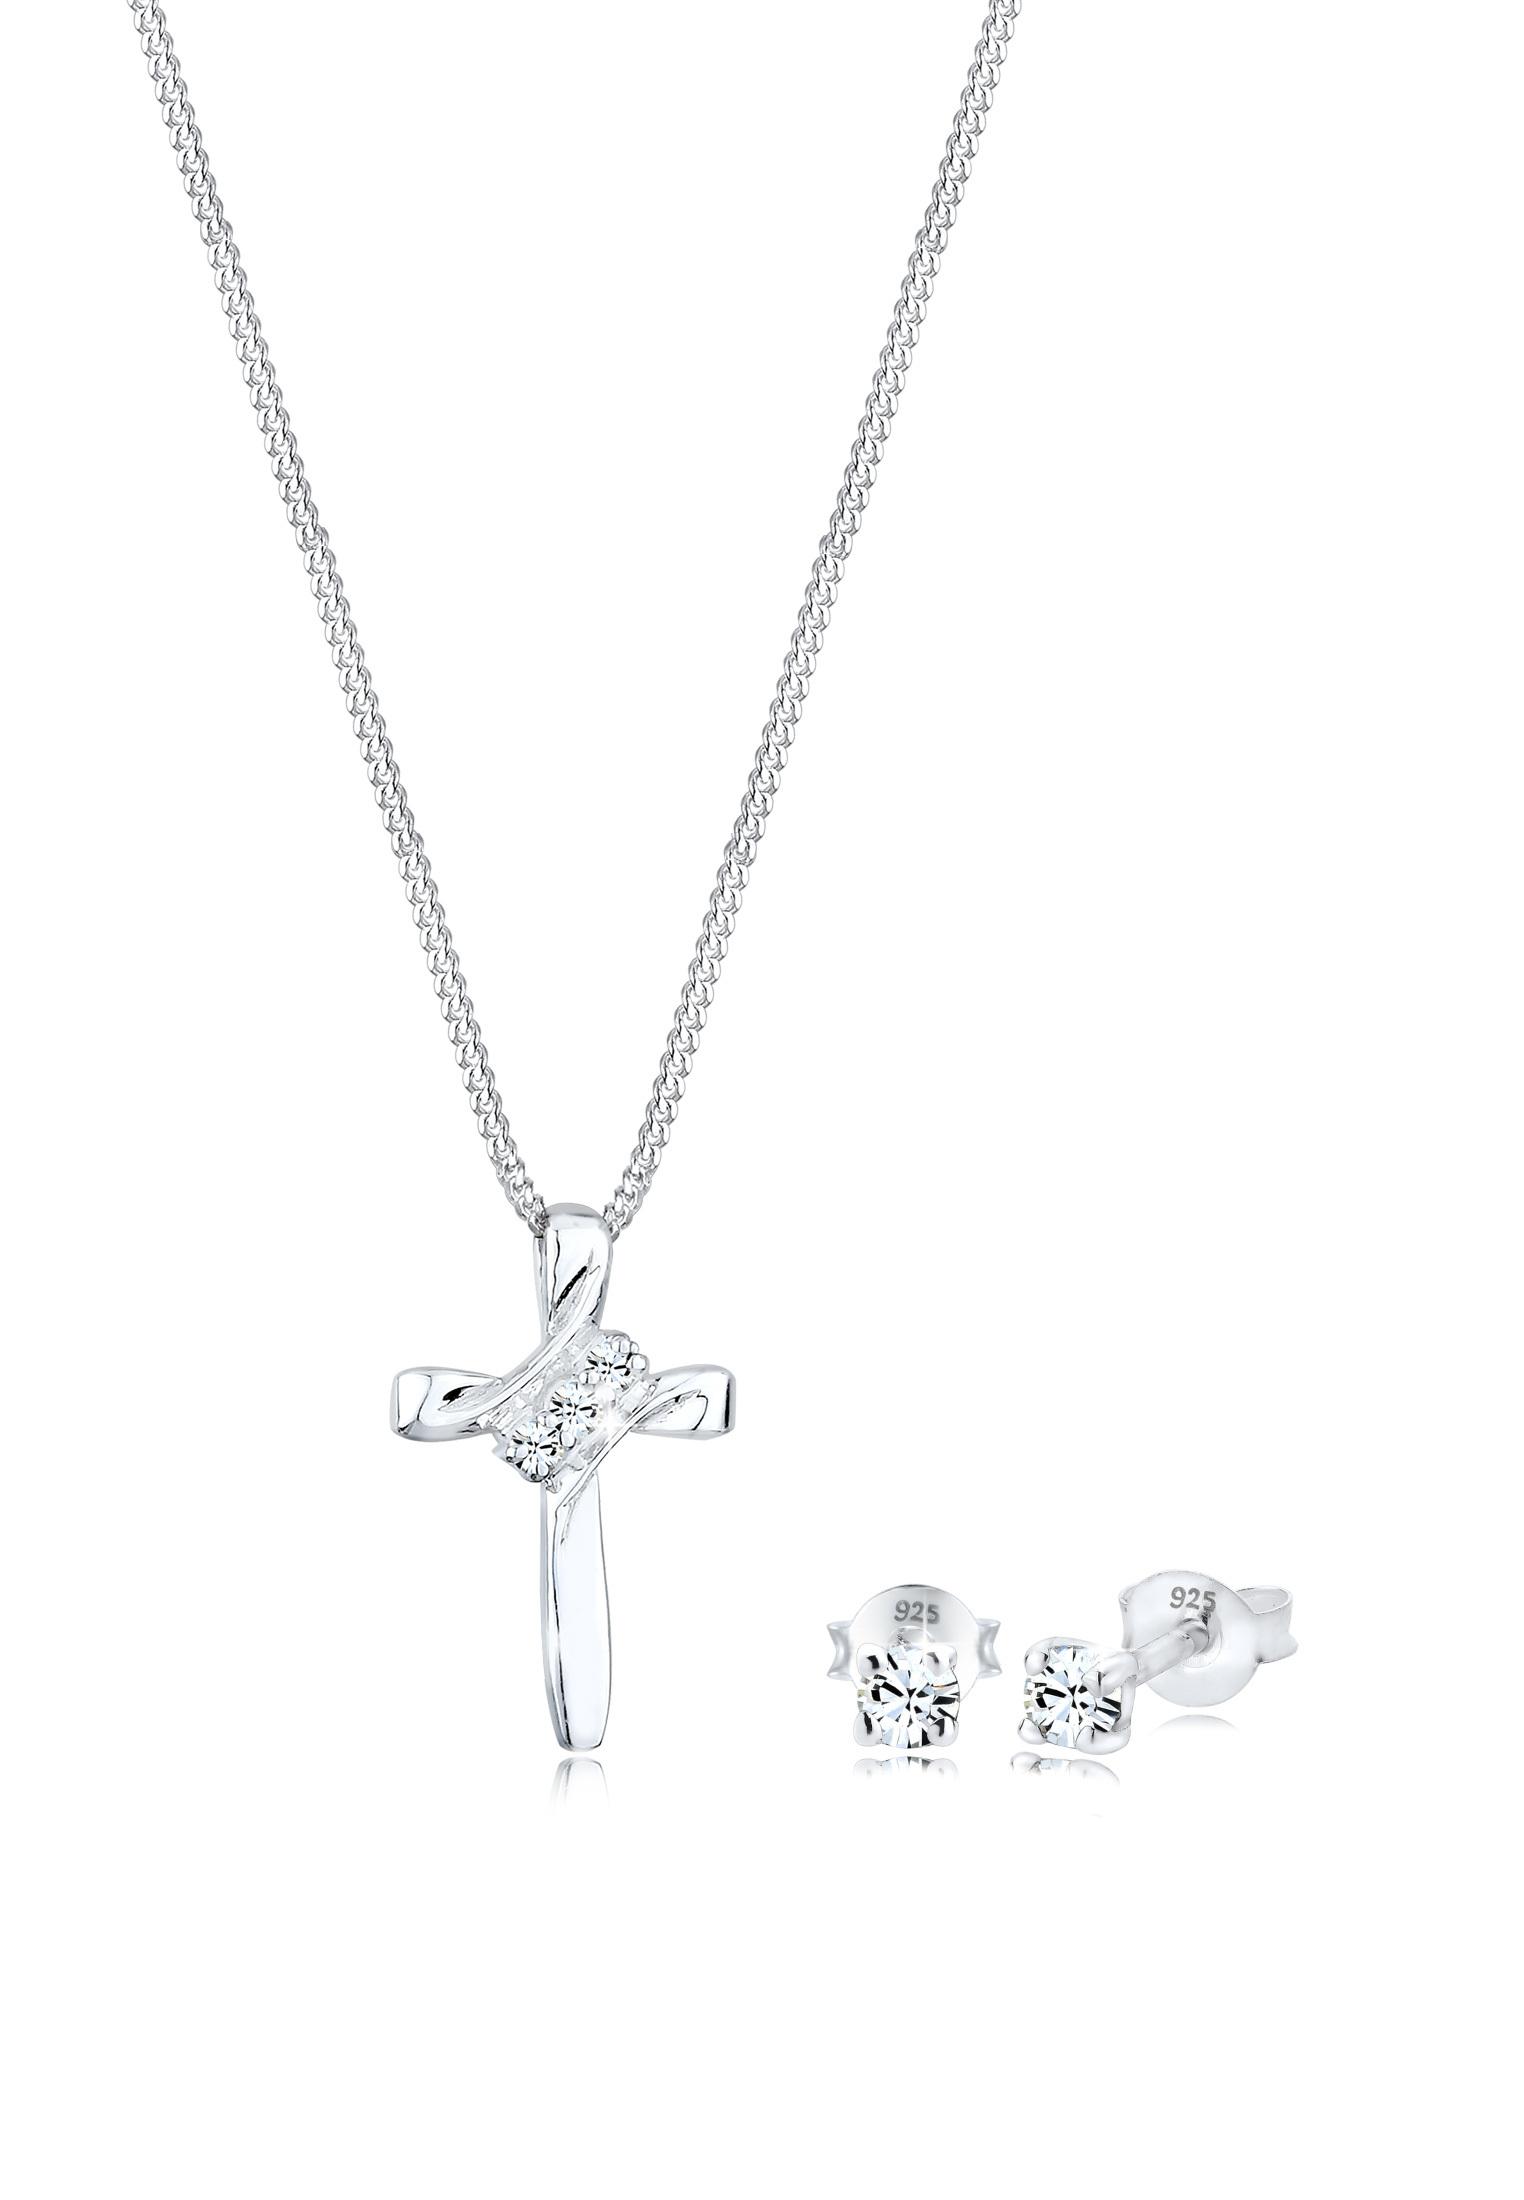 Schmuckset Kreuz   Kristall ( Weiß )   925er Sterling Silber